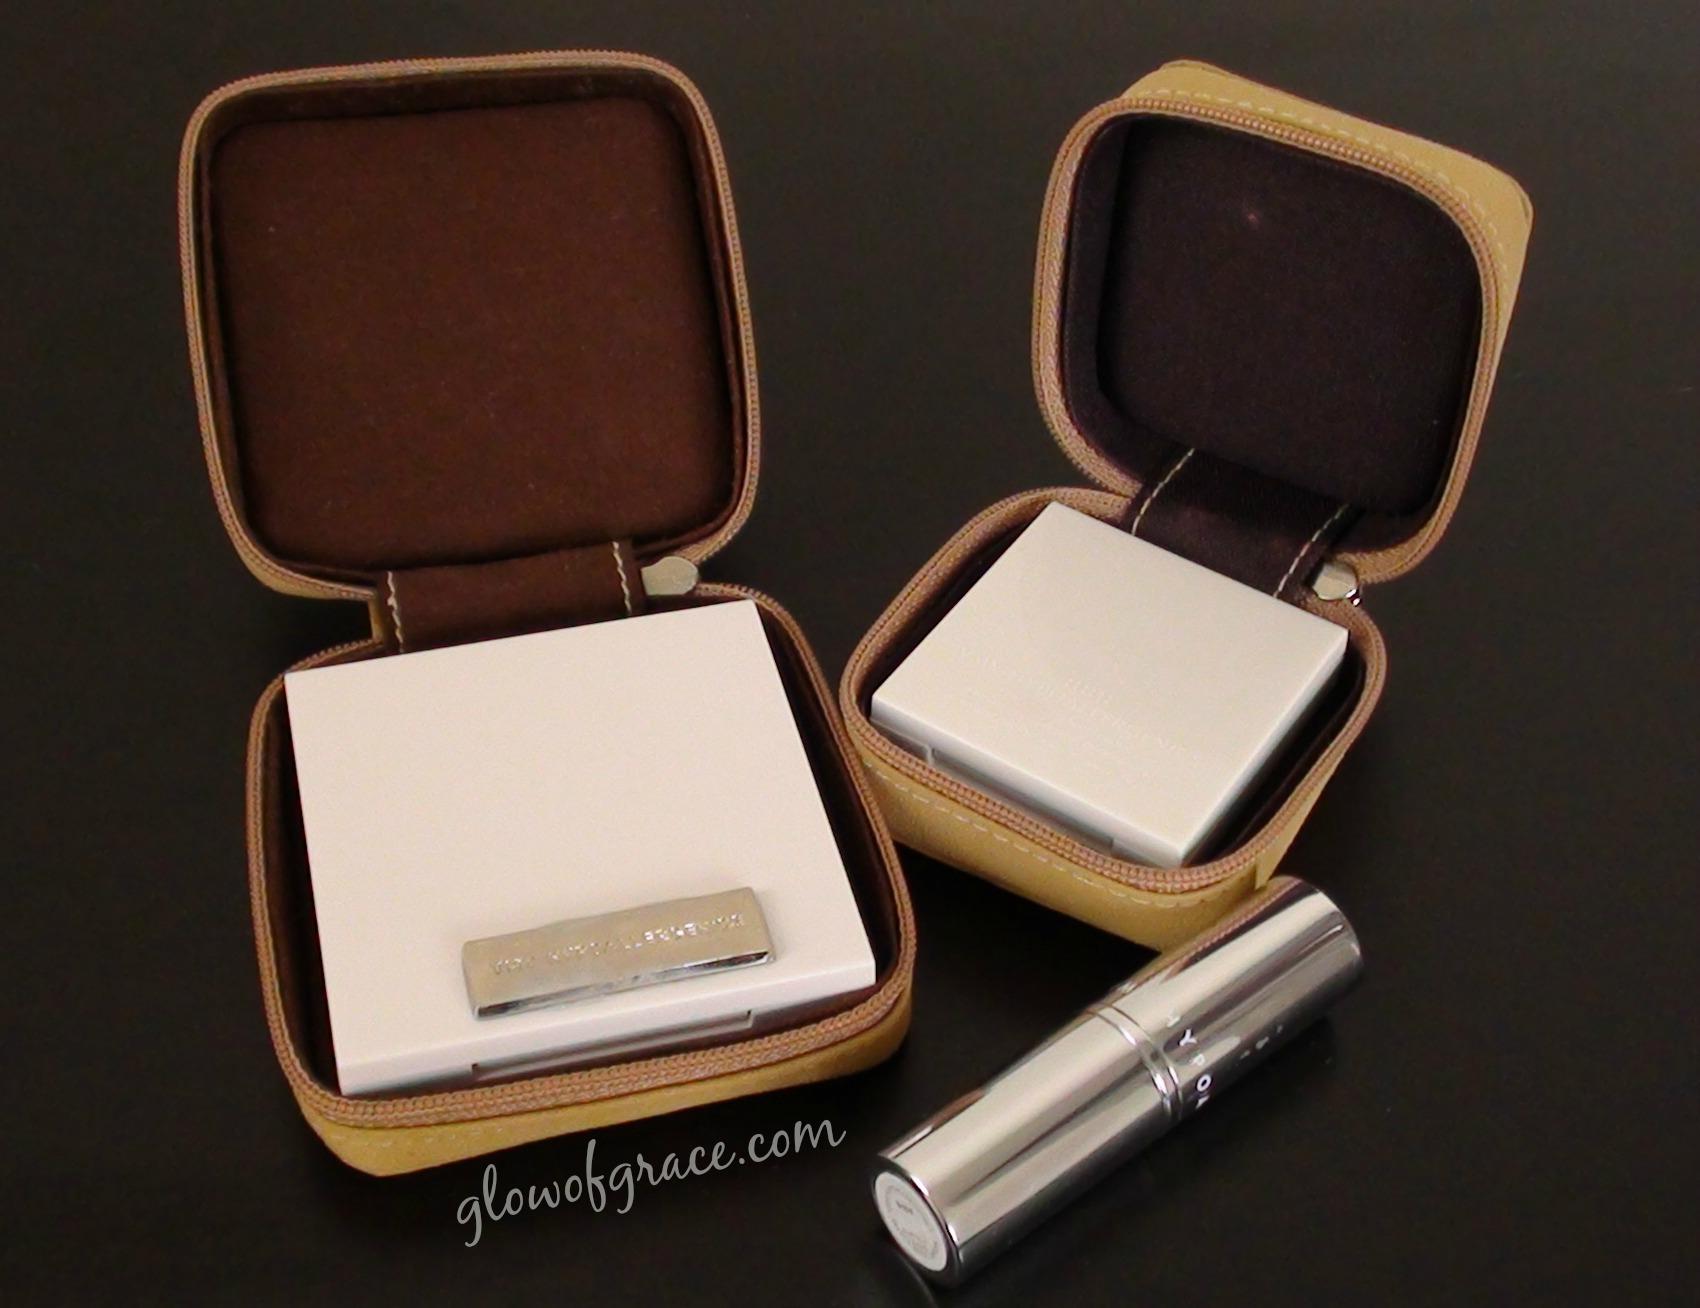 VMV Cosmetics | glowofgrace